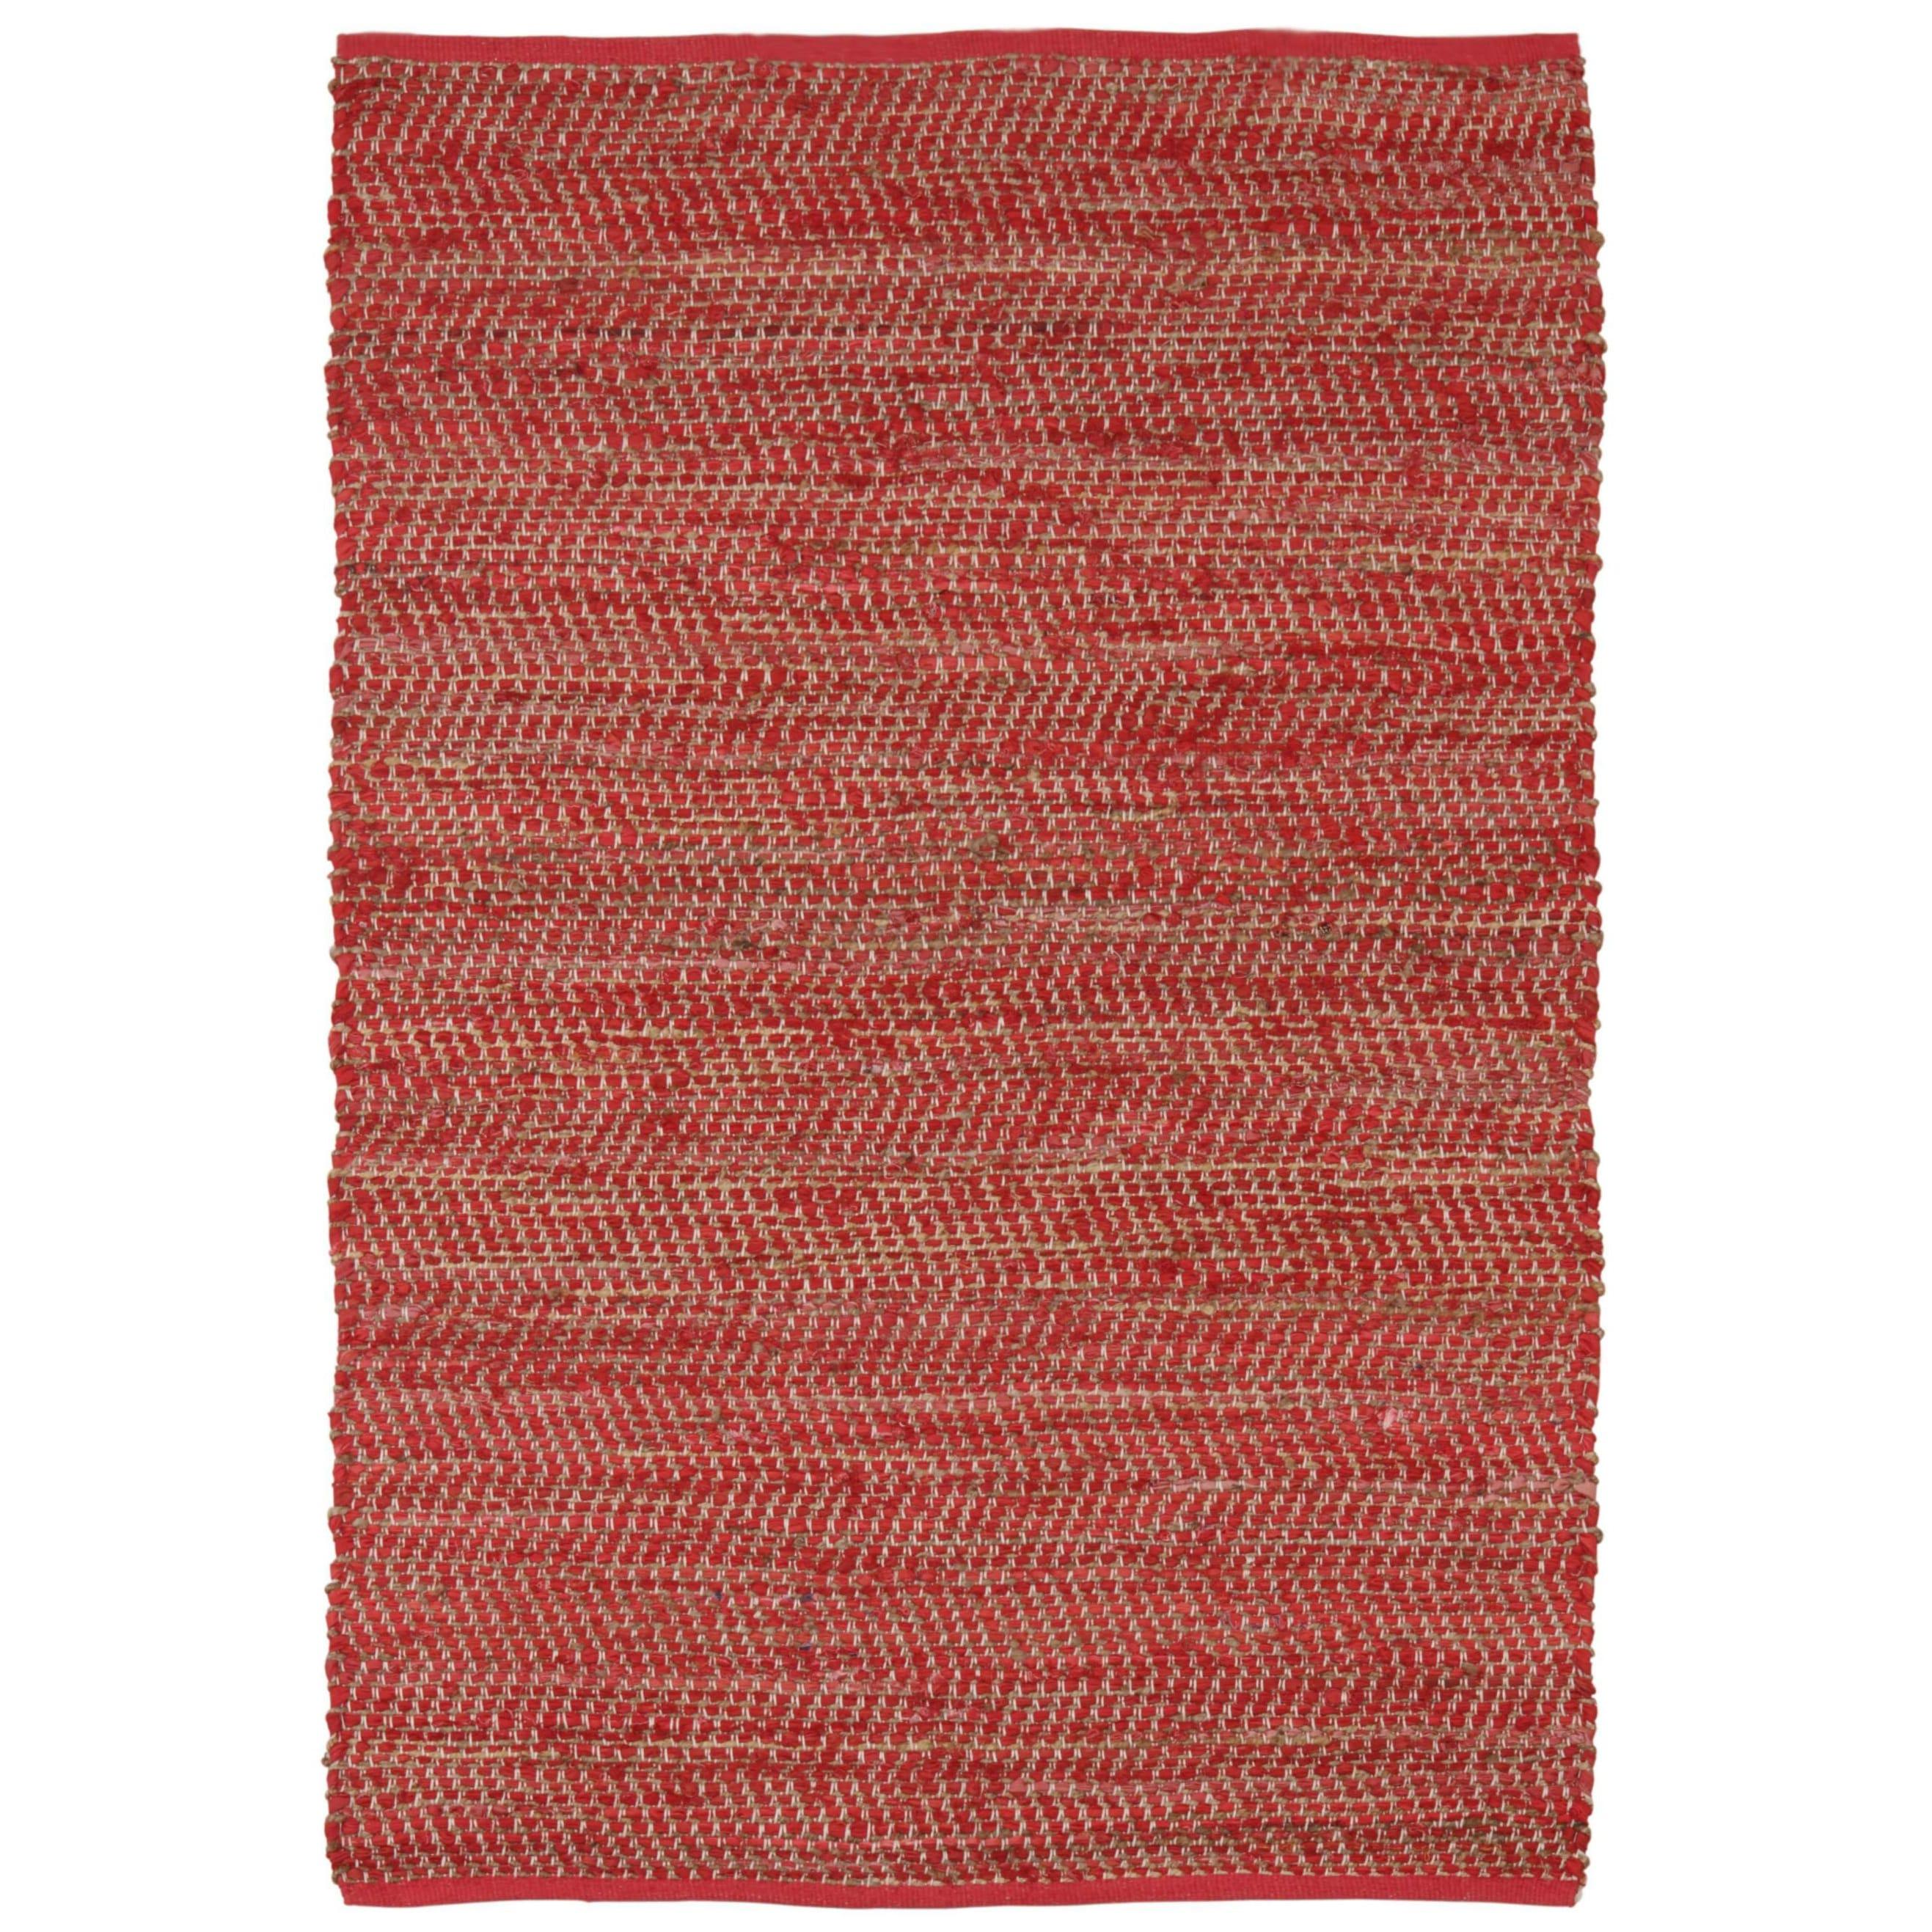 St. Croix Red Jeans Hand-woven Denim & Hemp (4' x 6') (Re...